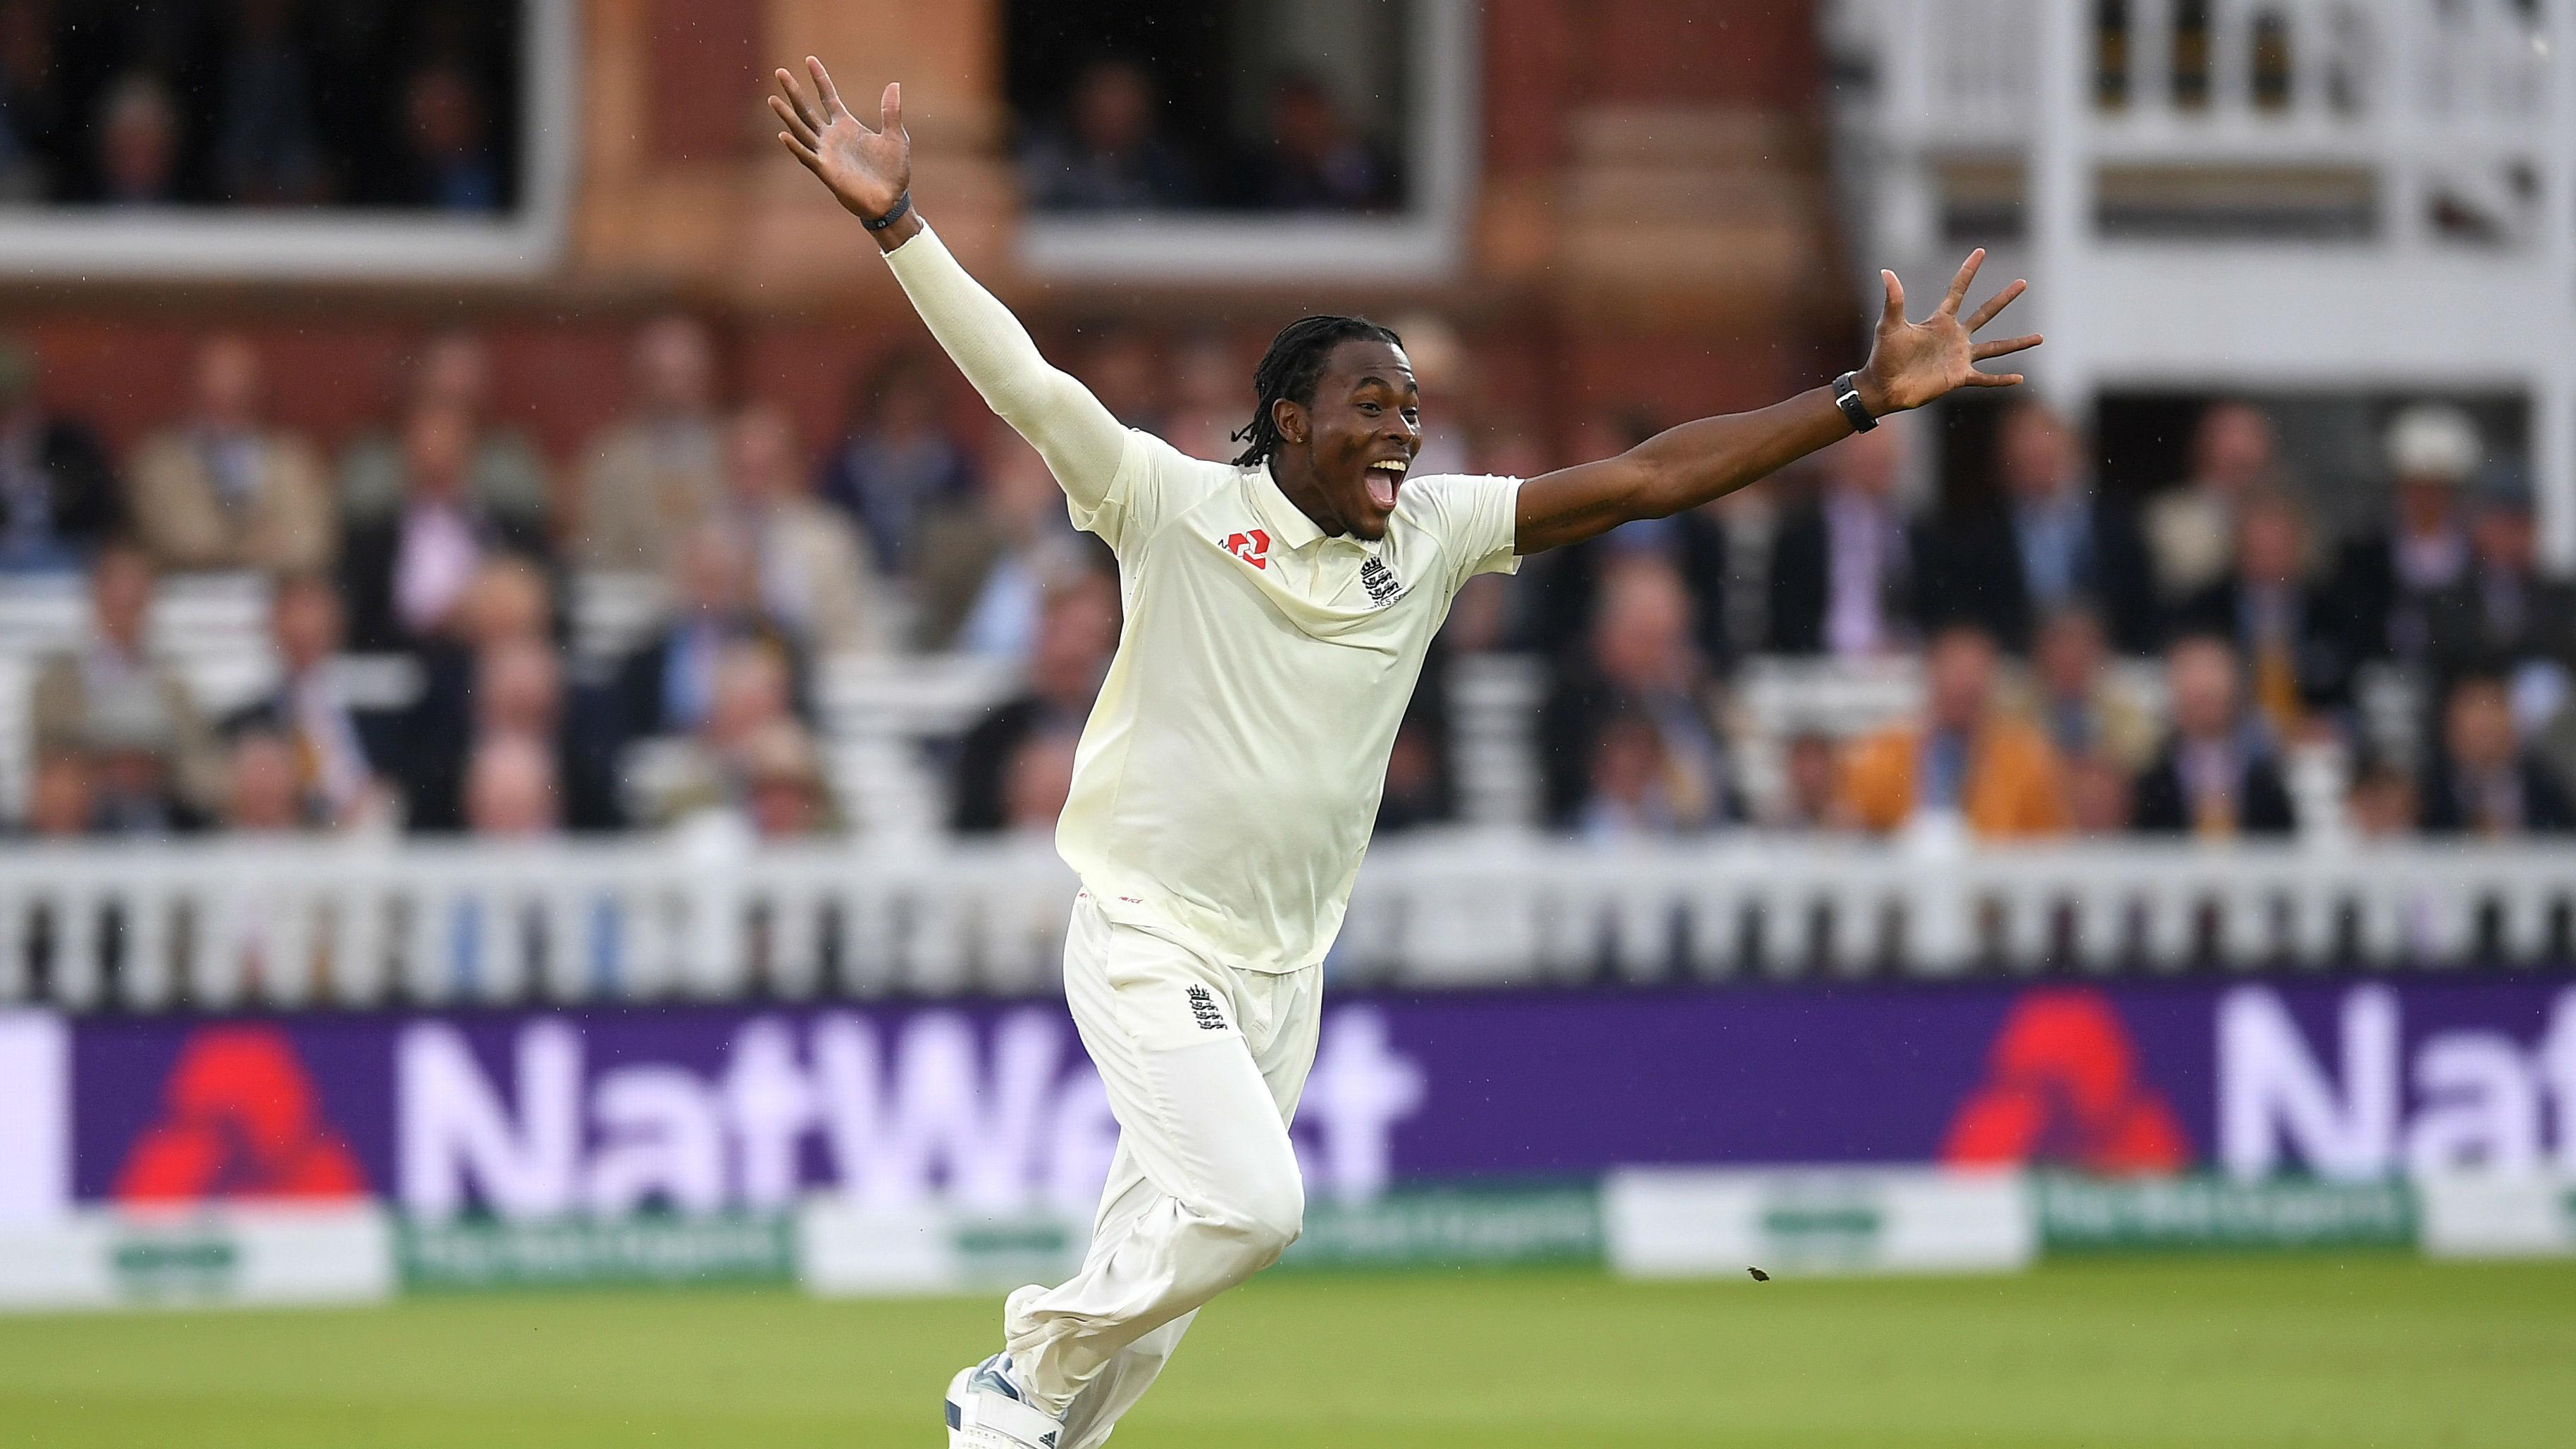 Stuart Broad backs Jofra Archer to 'blow teams away' in Test cricket